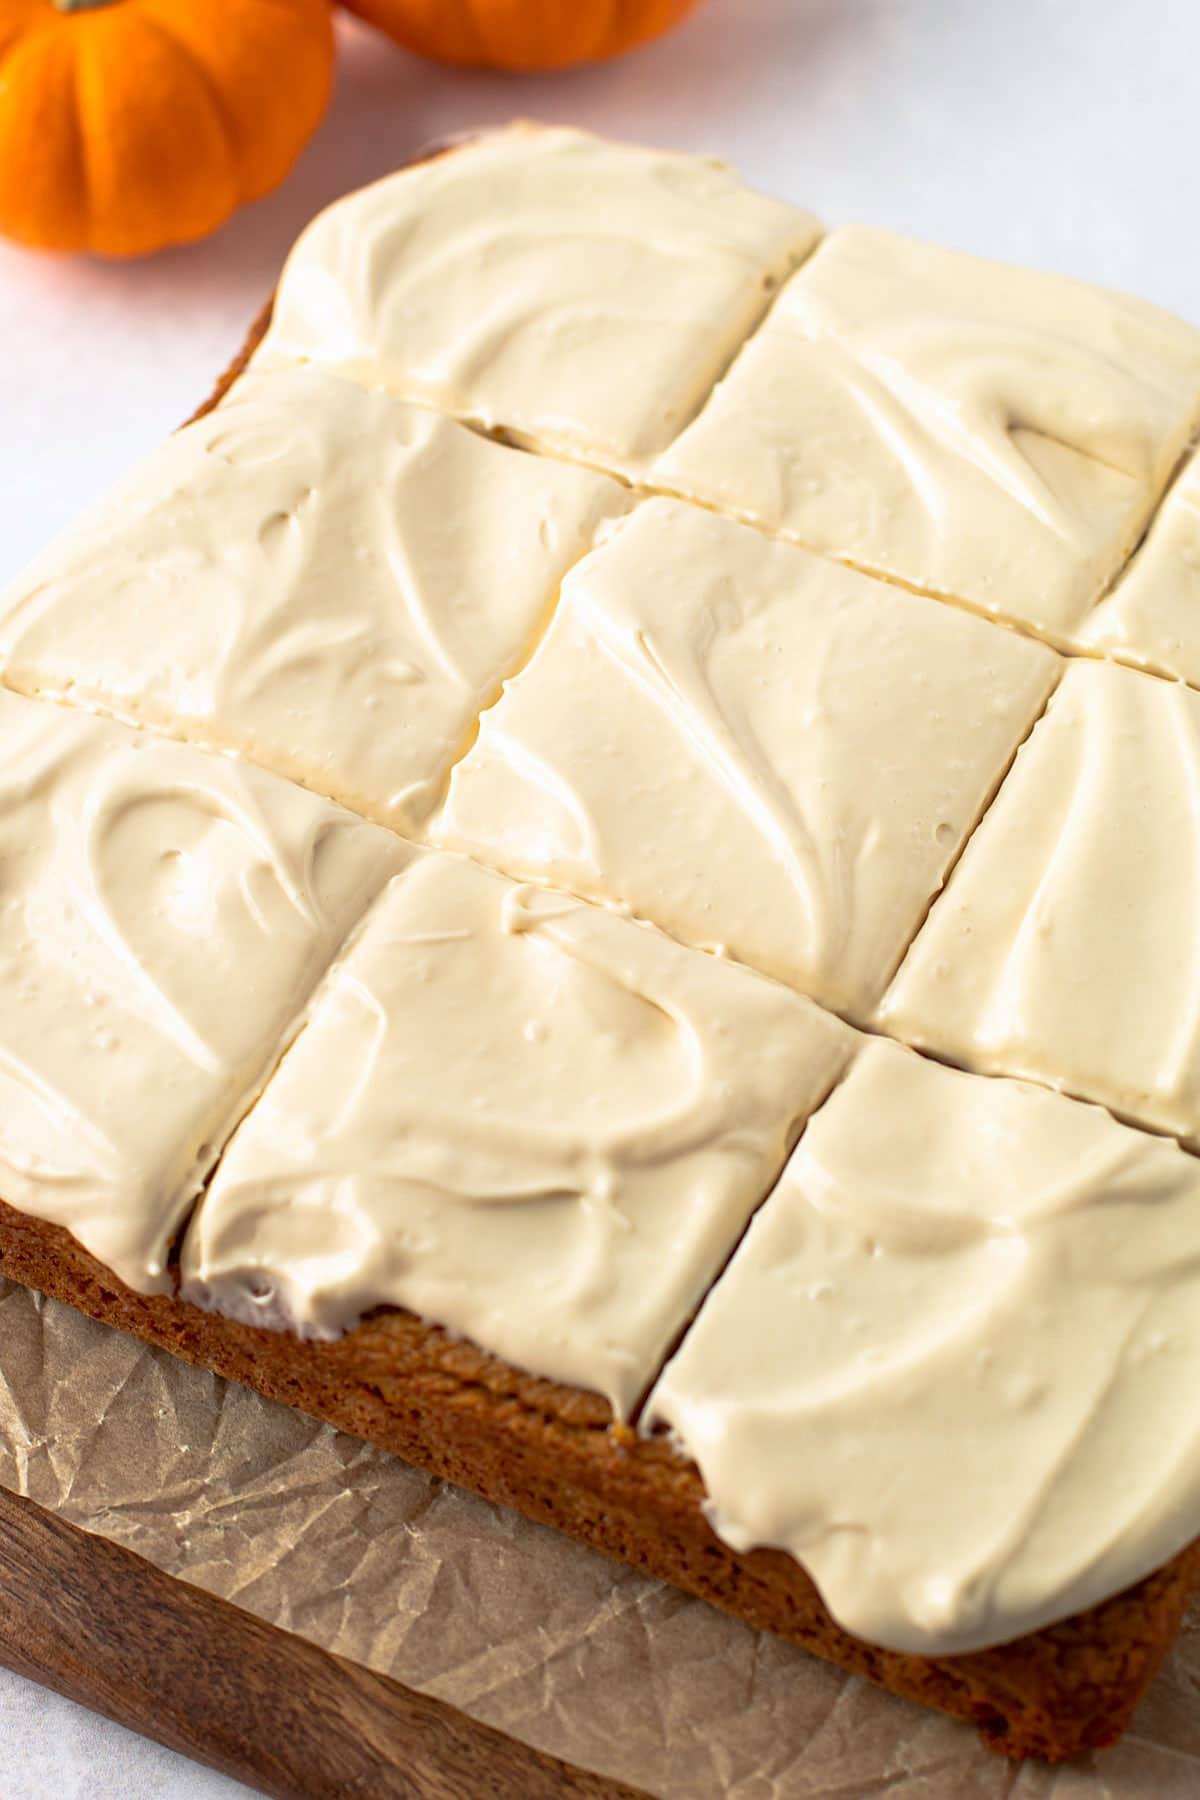 Sliced gluten free pumpkin cake with cream cheese frosting.